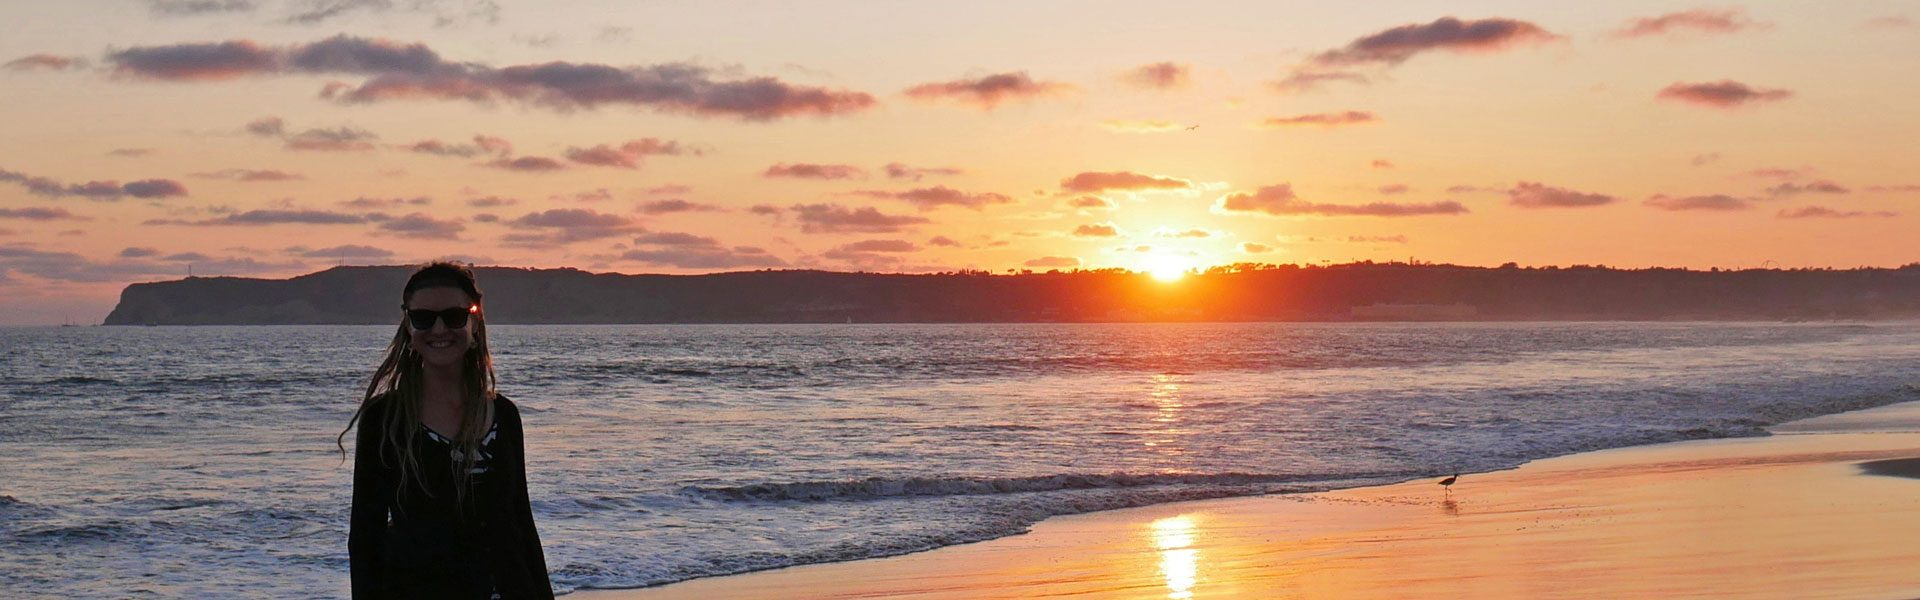 Rasta girl during sunset at Coronado Beach in San Diego, CA